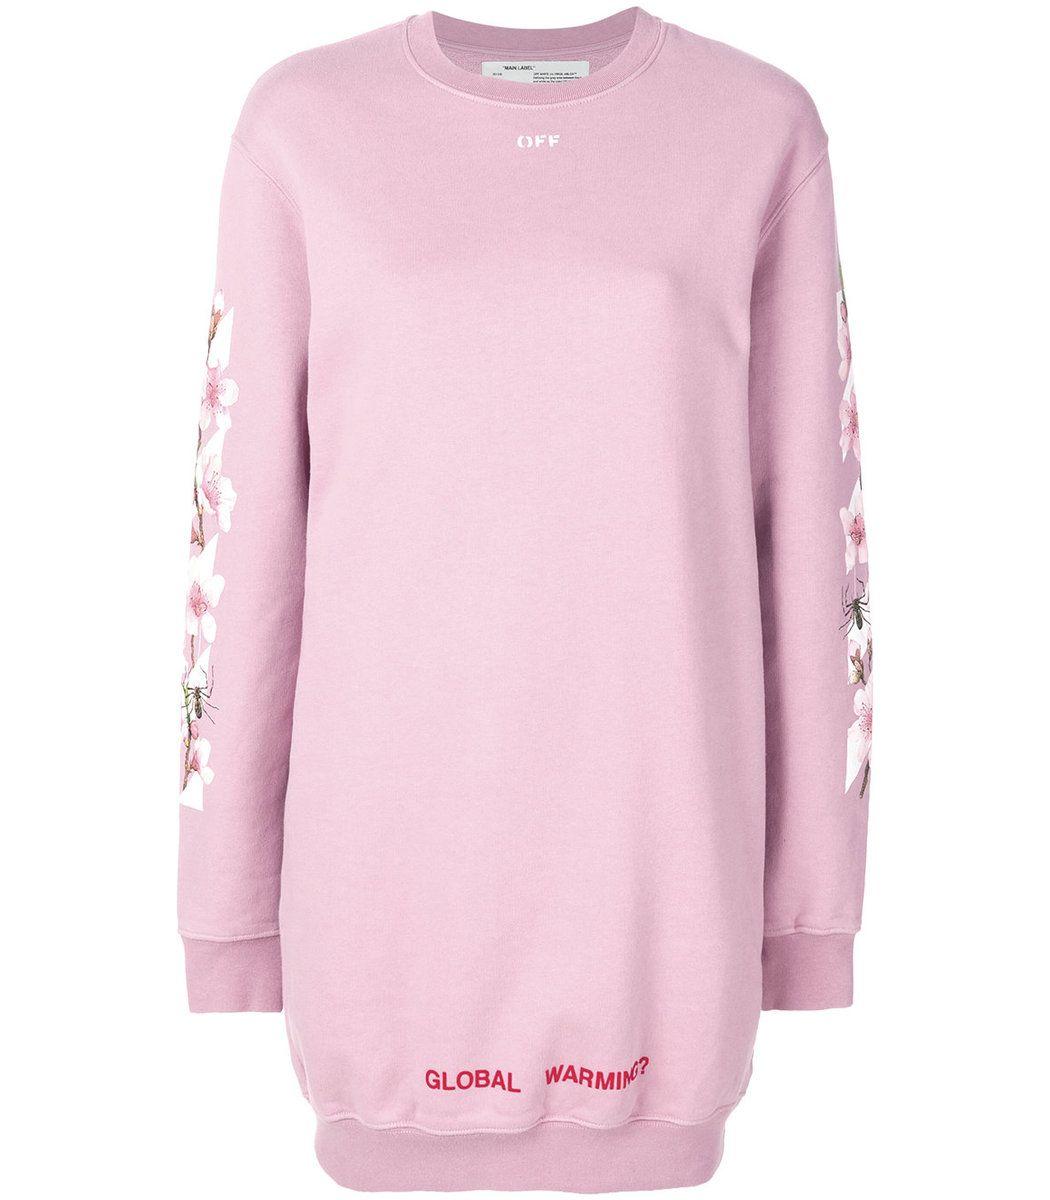 Off White Pink Cherry Flower Sweatshirt Dress Off White Cloth Long Sleeve Cotton Dress Sweatshirt Dress Pink Long Sleeve Dress [ 1200 x 1050 Pixel ]